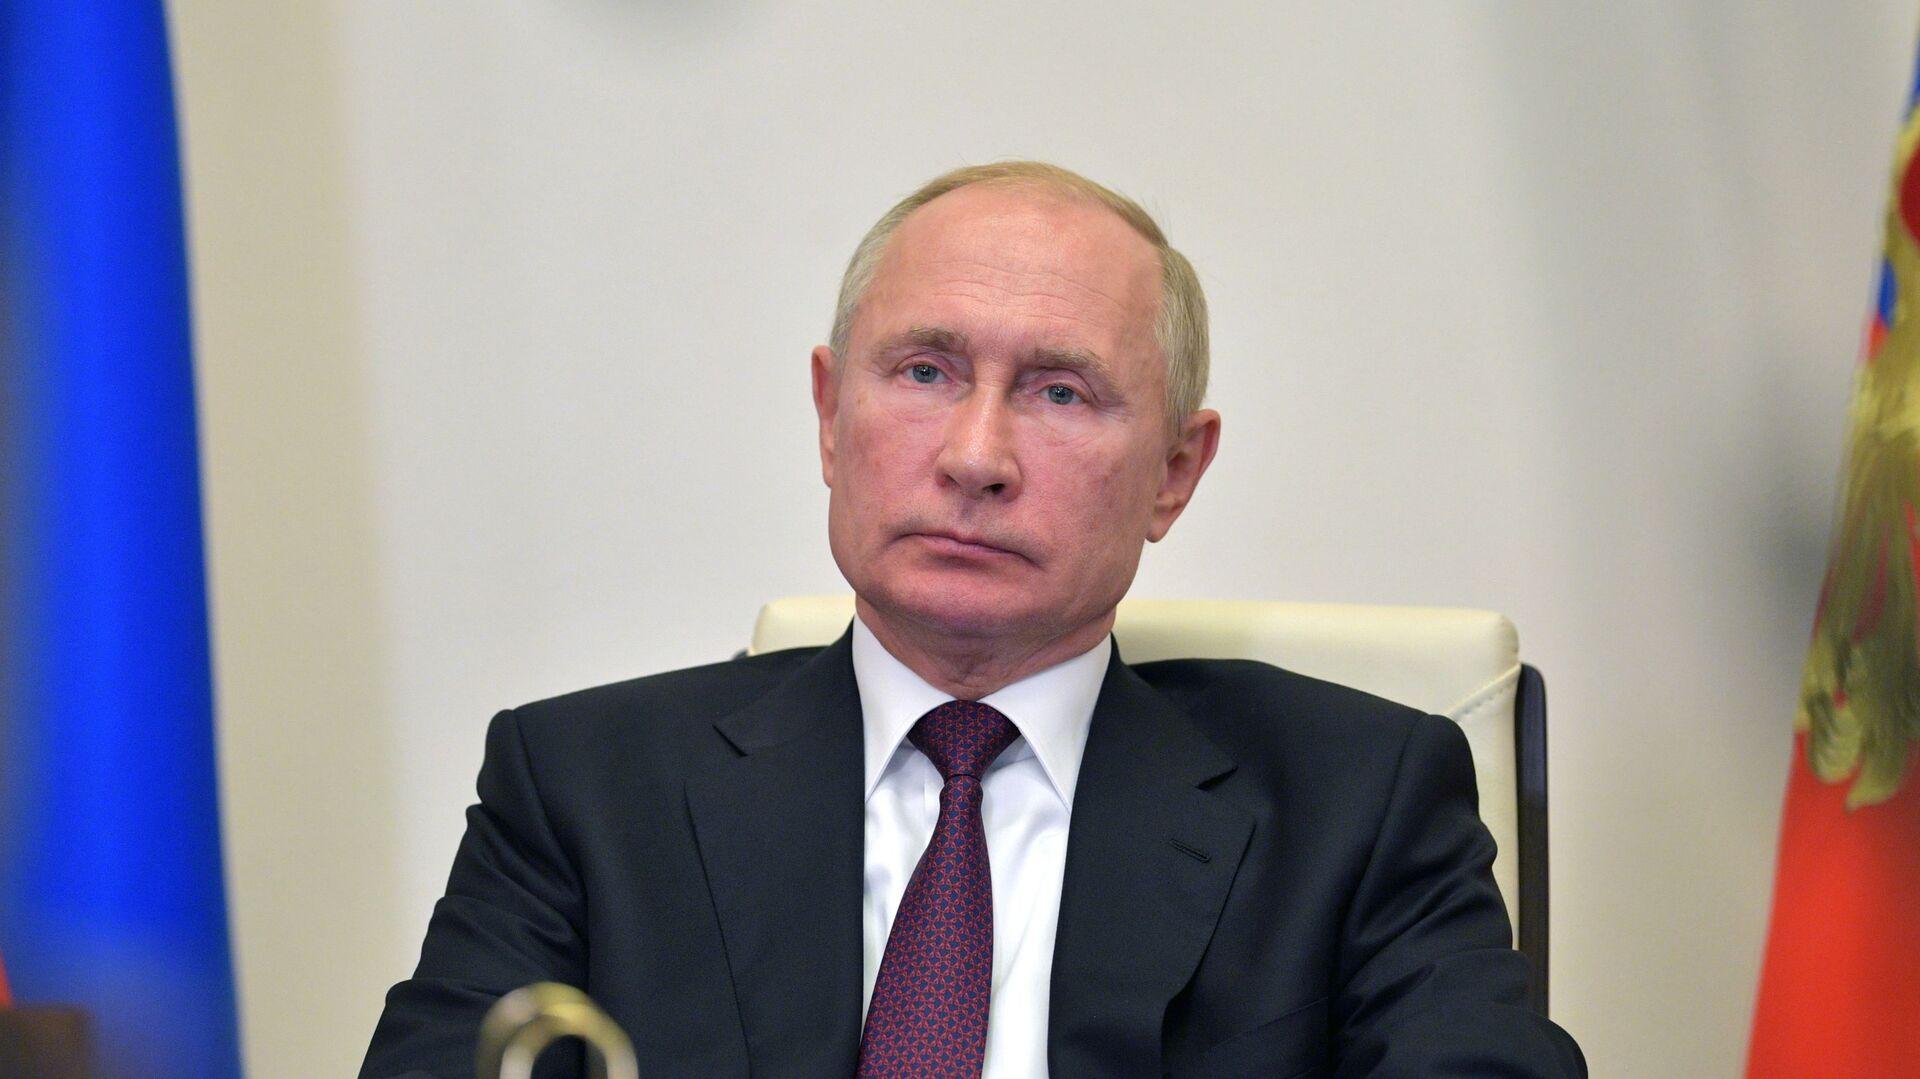 Vladímir Putin, presidente de Rusia - Sputnik Mundo, 1920, 20.04.2021